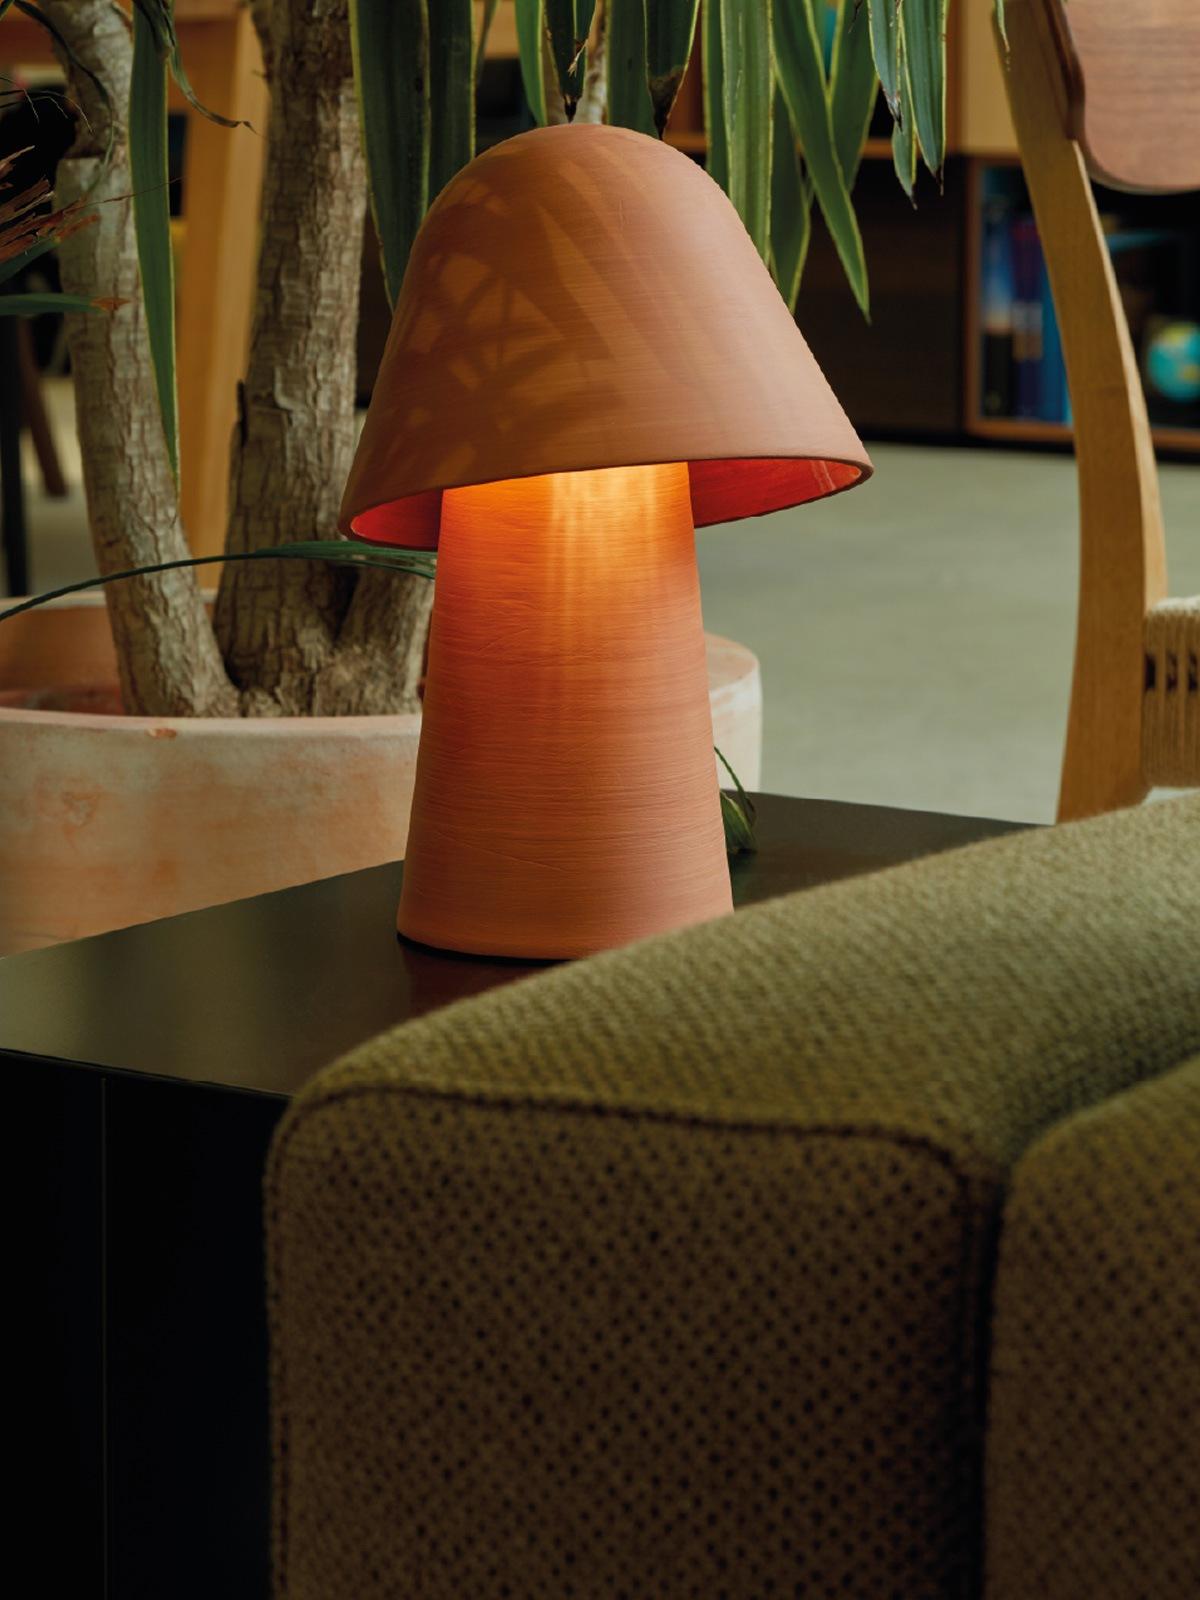 DesignOrt Blog: Okina Table Tischlampe aus Keramik Pott Designort Lampen Onlineshop Berlin